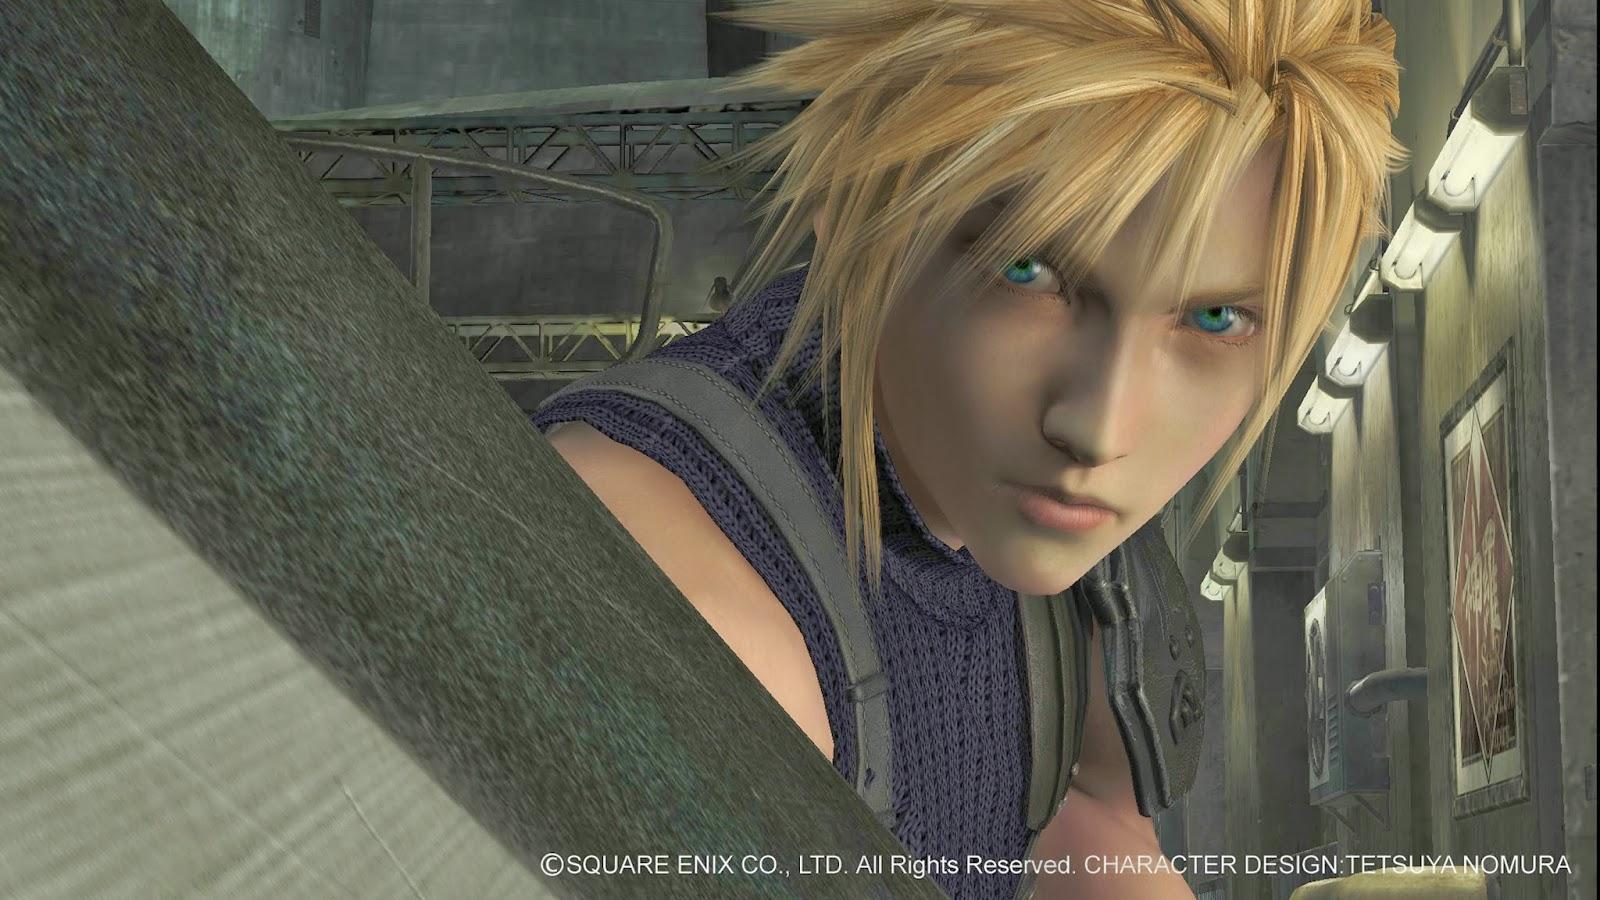 Final Fantasy Viii Remake Ps4 to Remake Final Fantasy